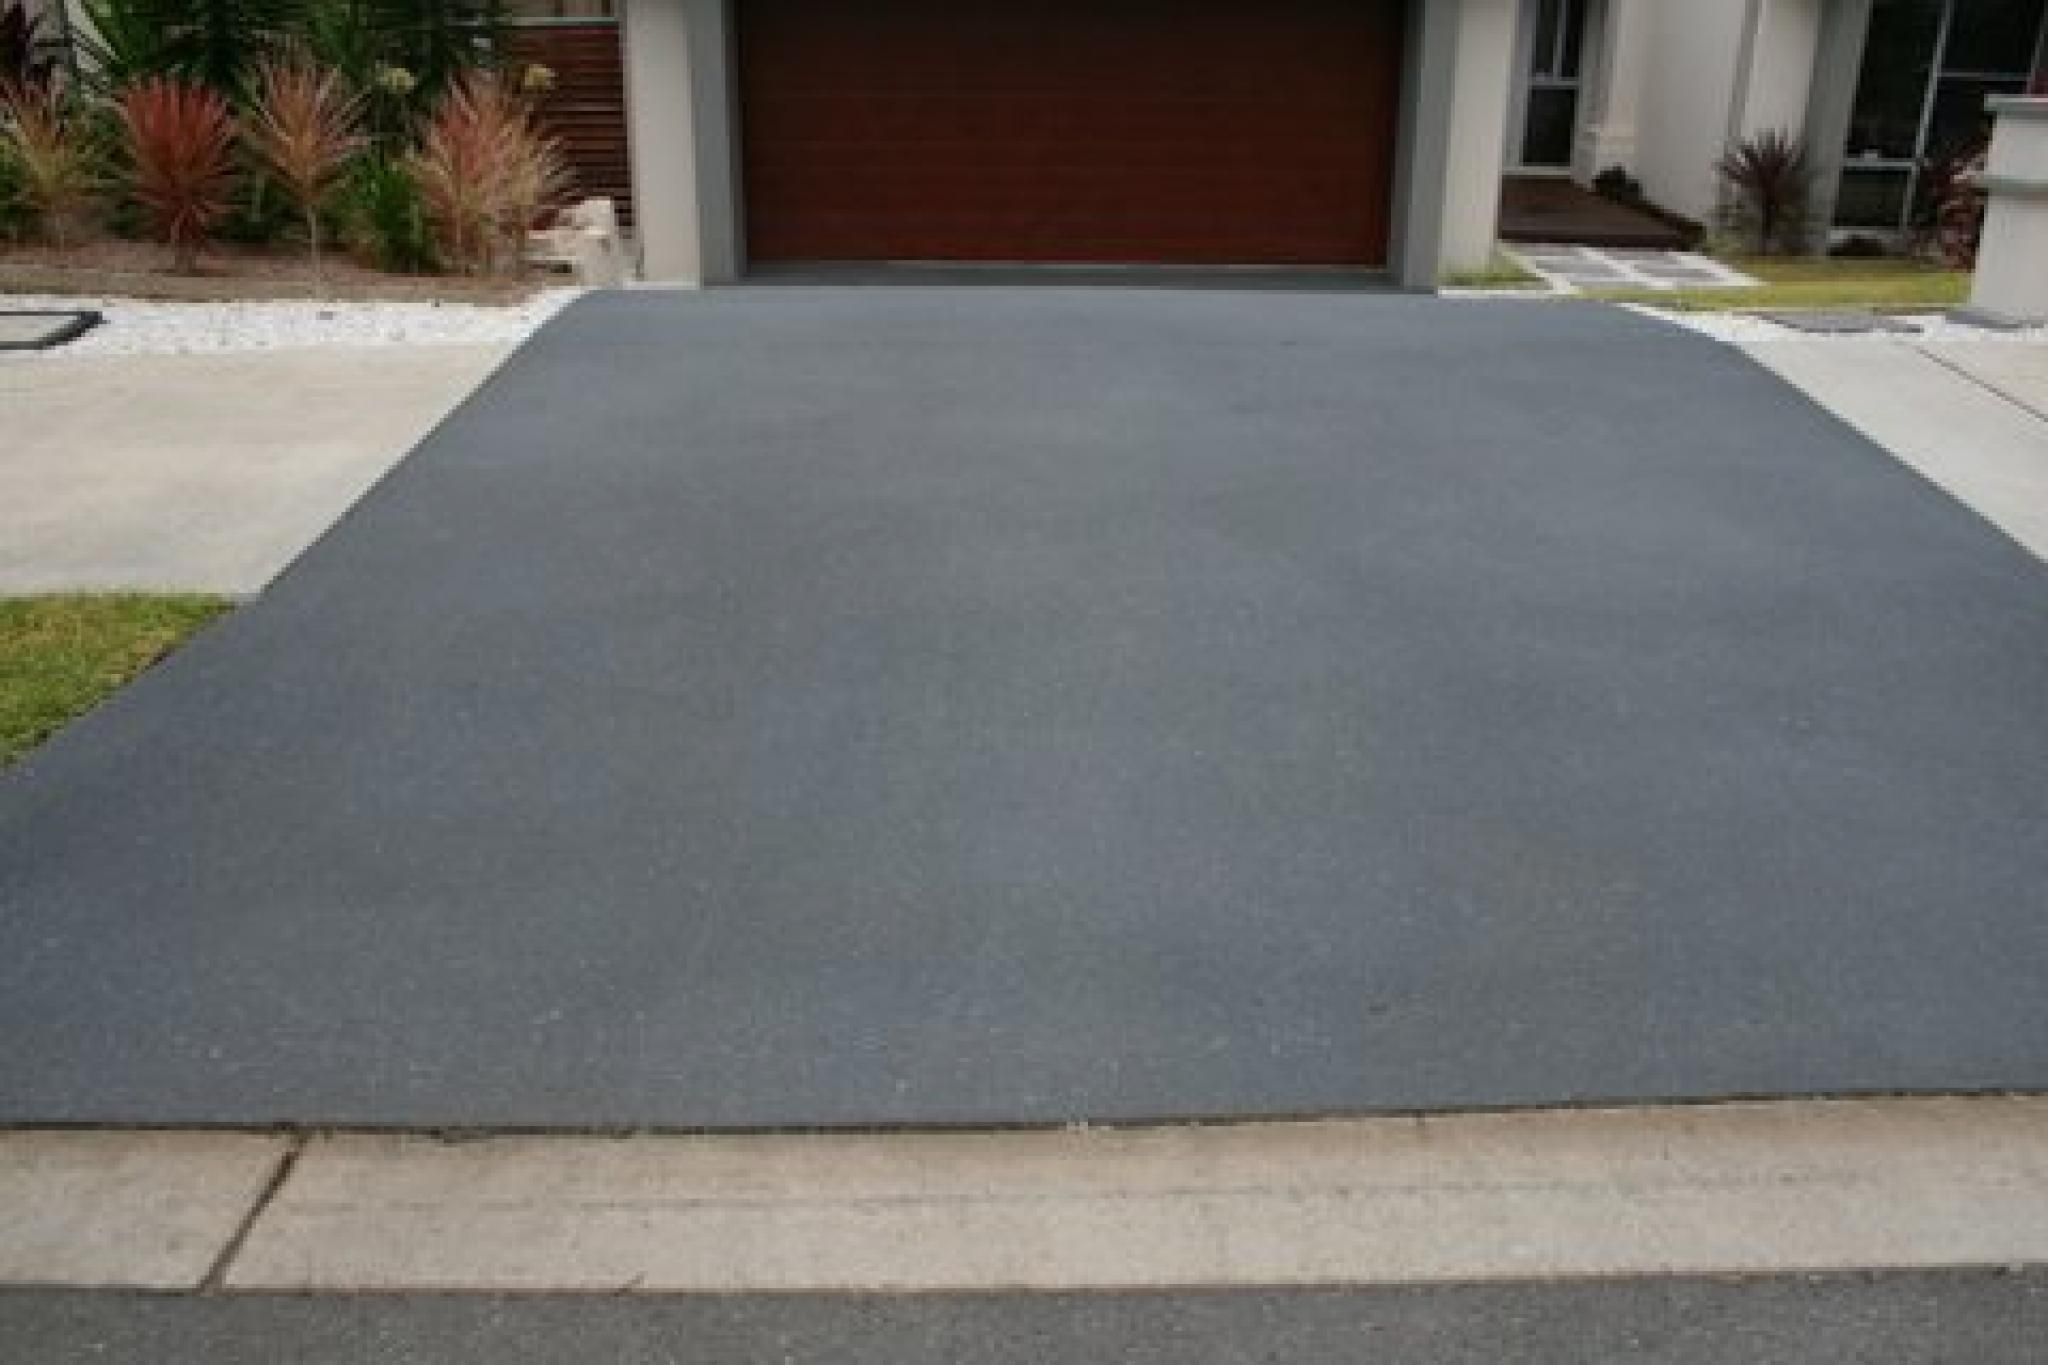 Gray Stamped Concrete Driveway